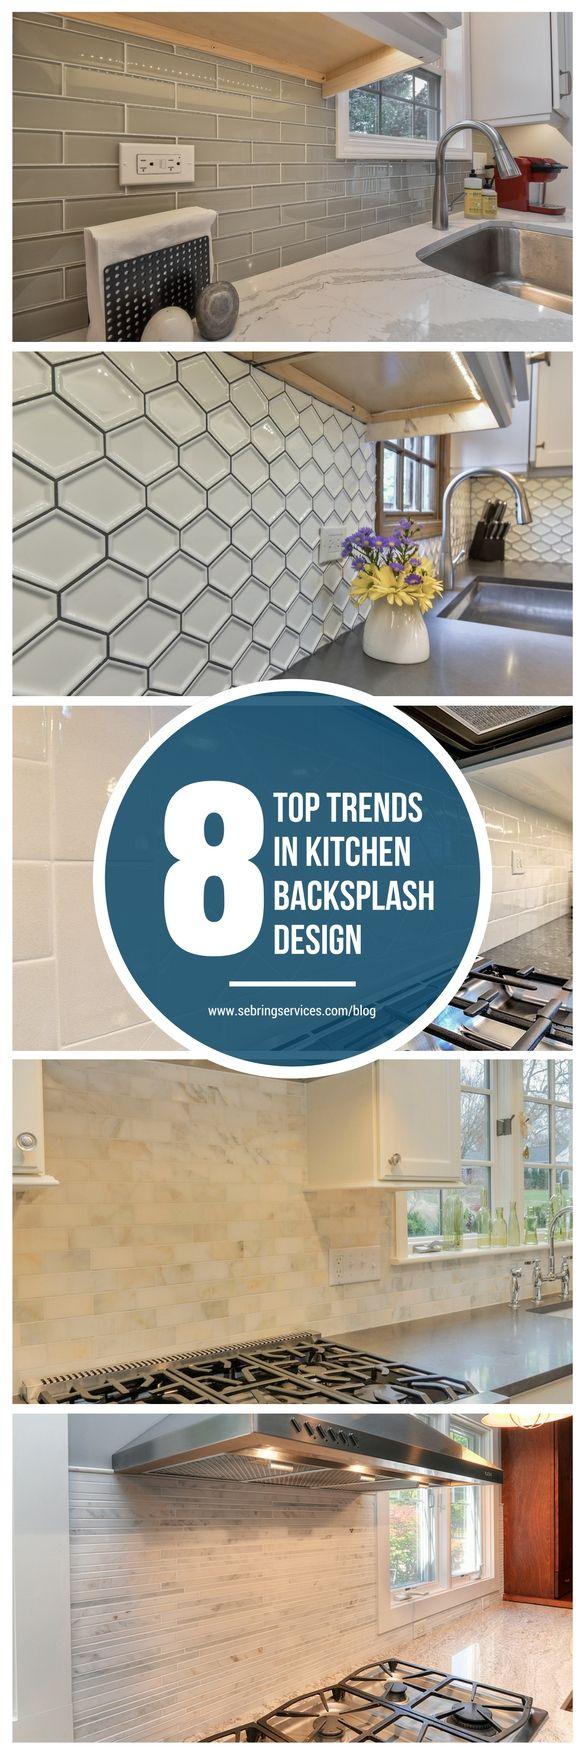 445 best pinner kitchens board 1 images on pinterest